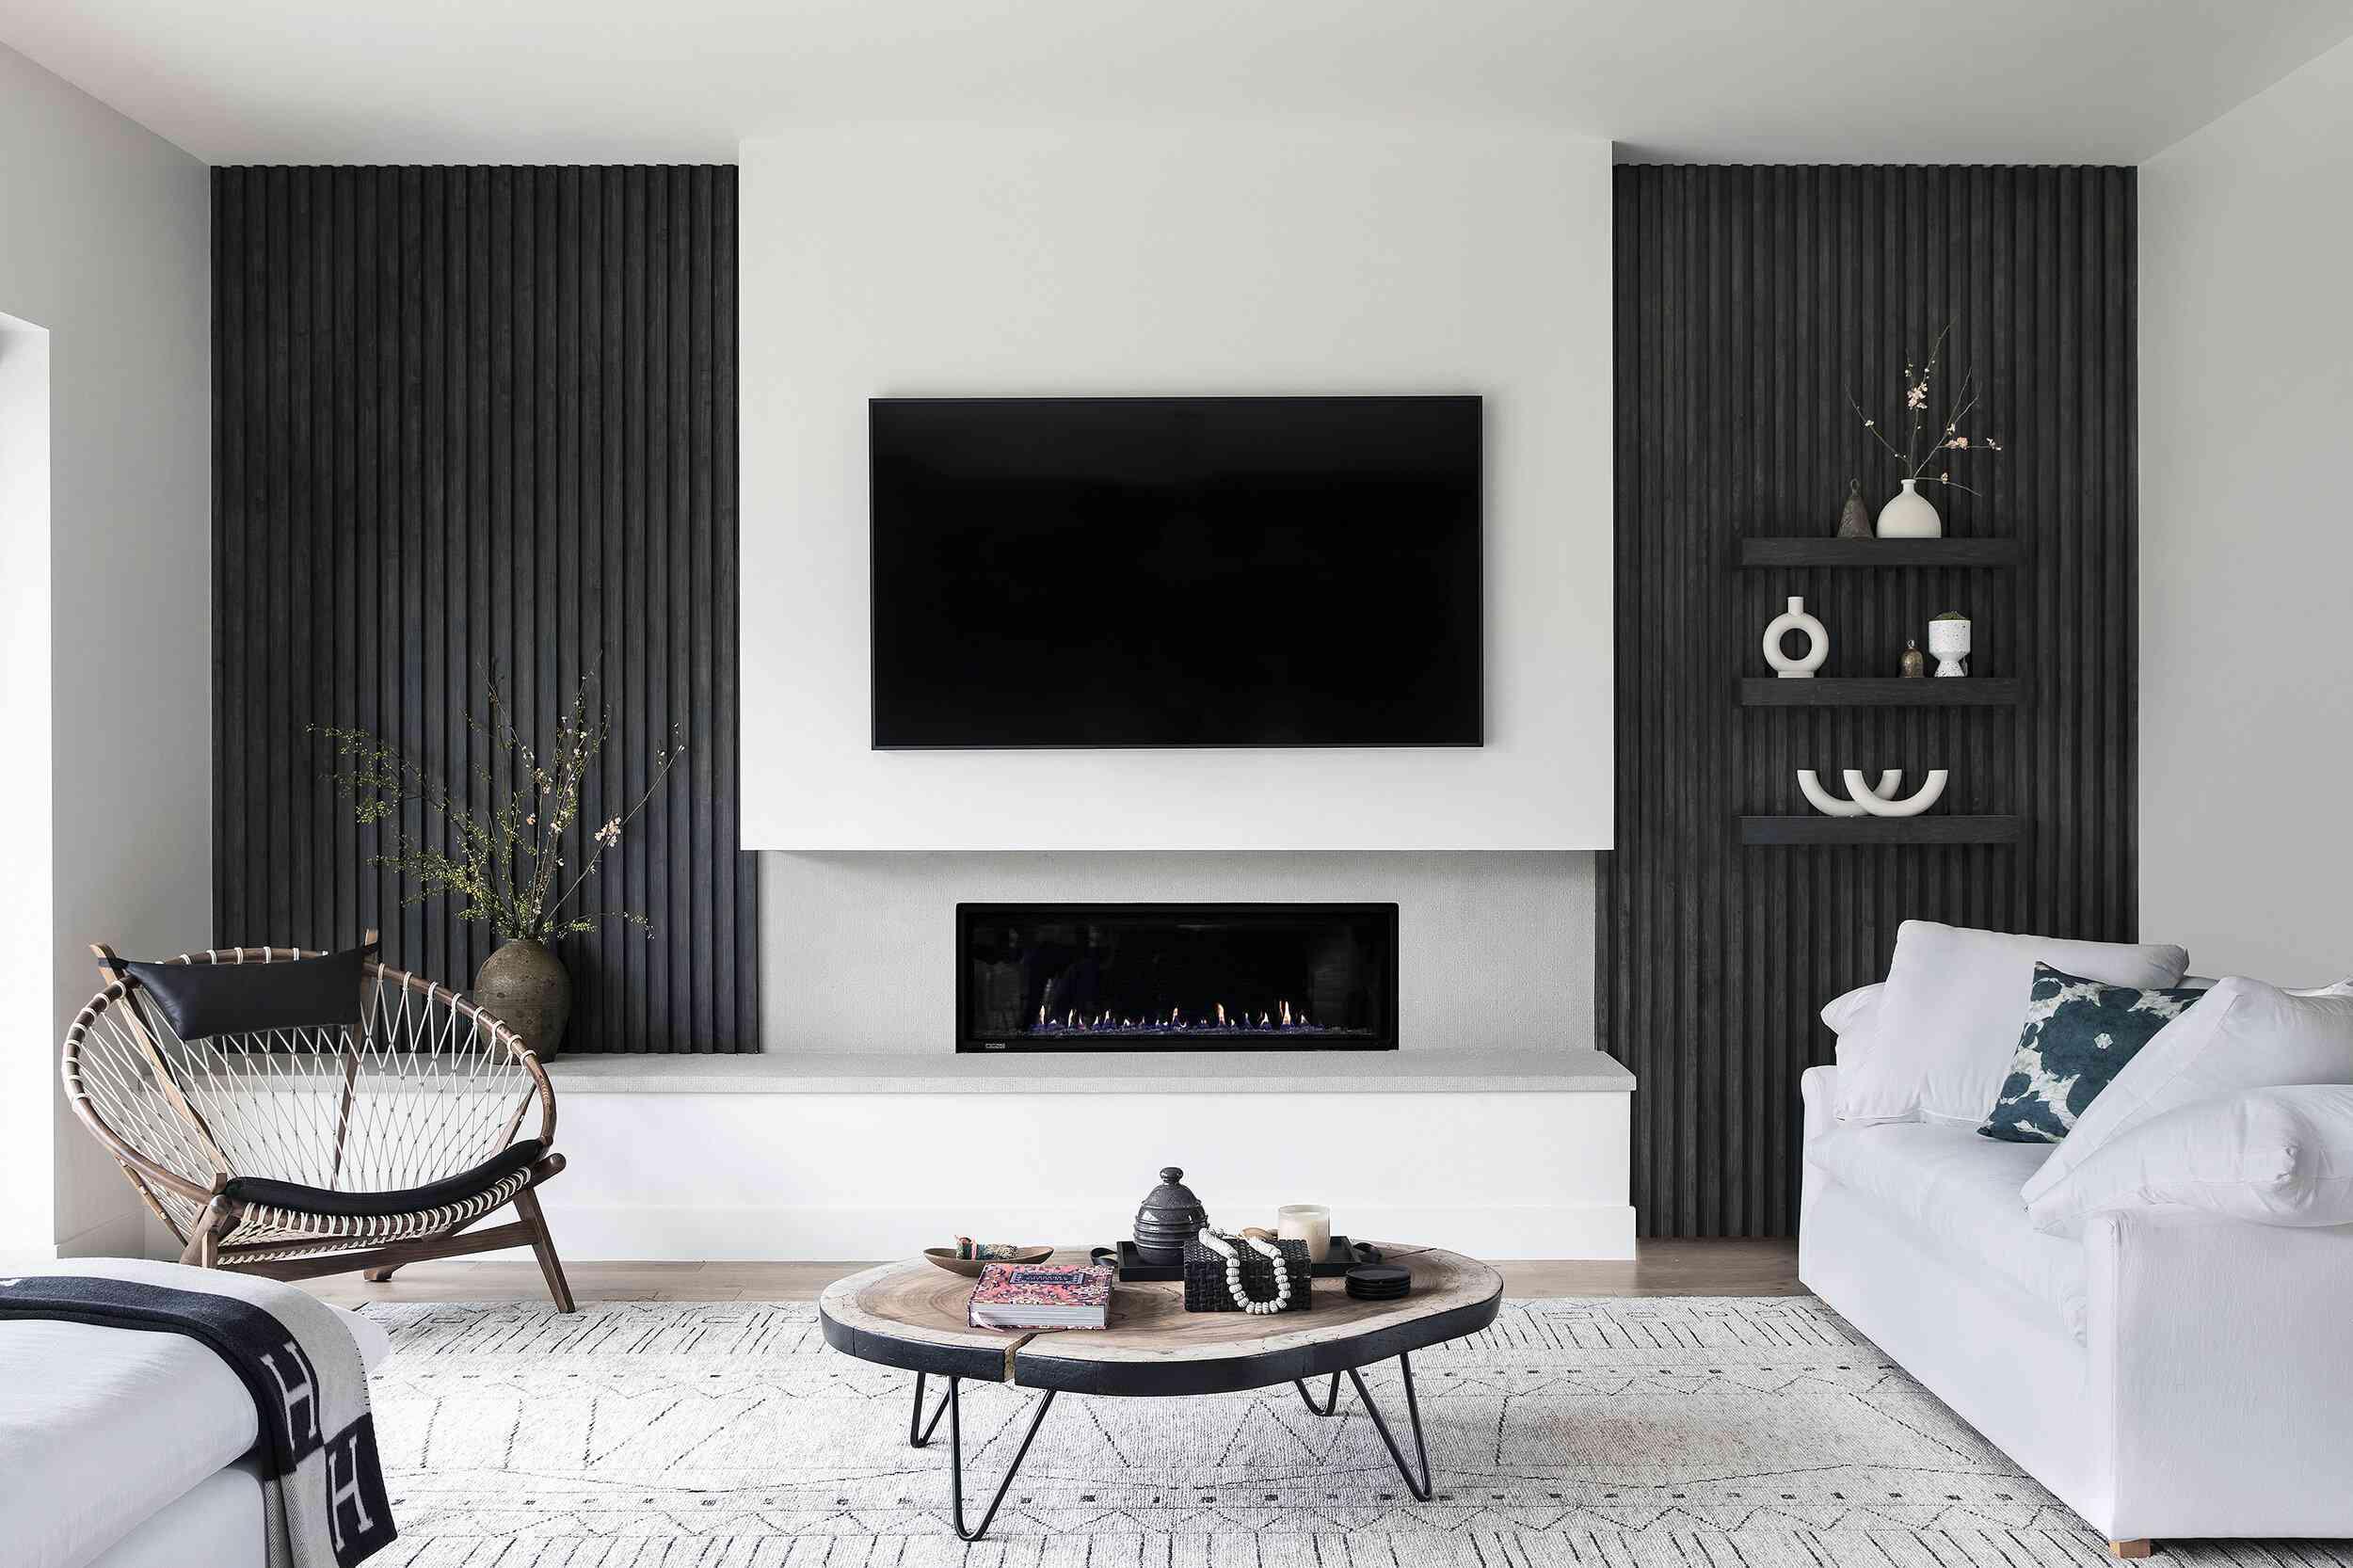 Sleek and modern black and white living room showcasing asymmetry